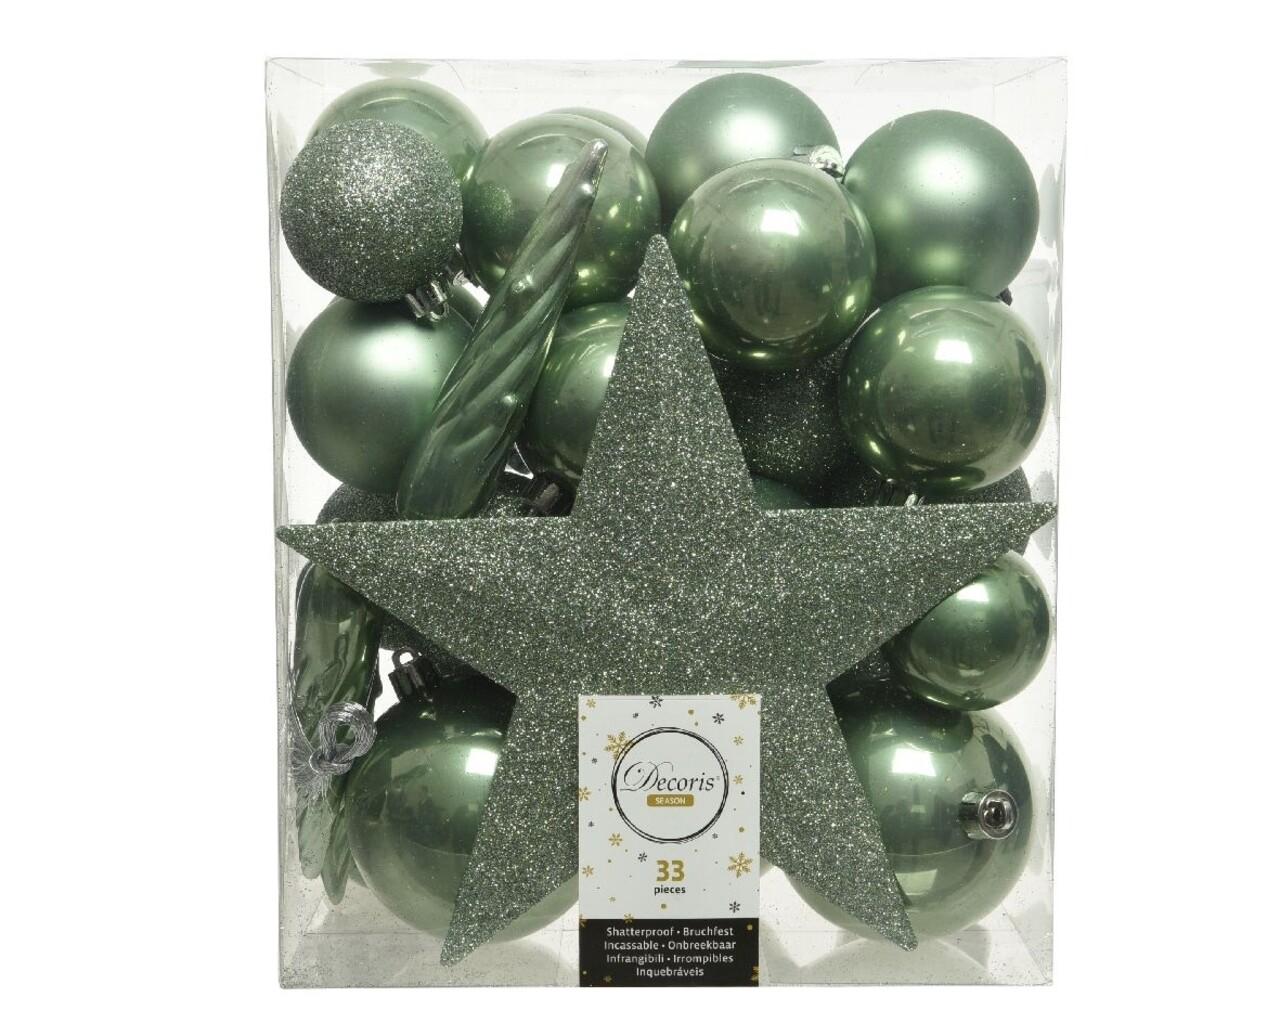 Cutie cu 33 globuri asortate si varf de brad Star Green, Decoris, plastic, verde